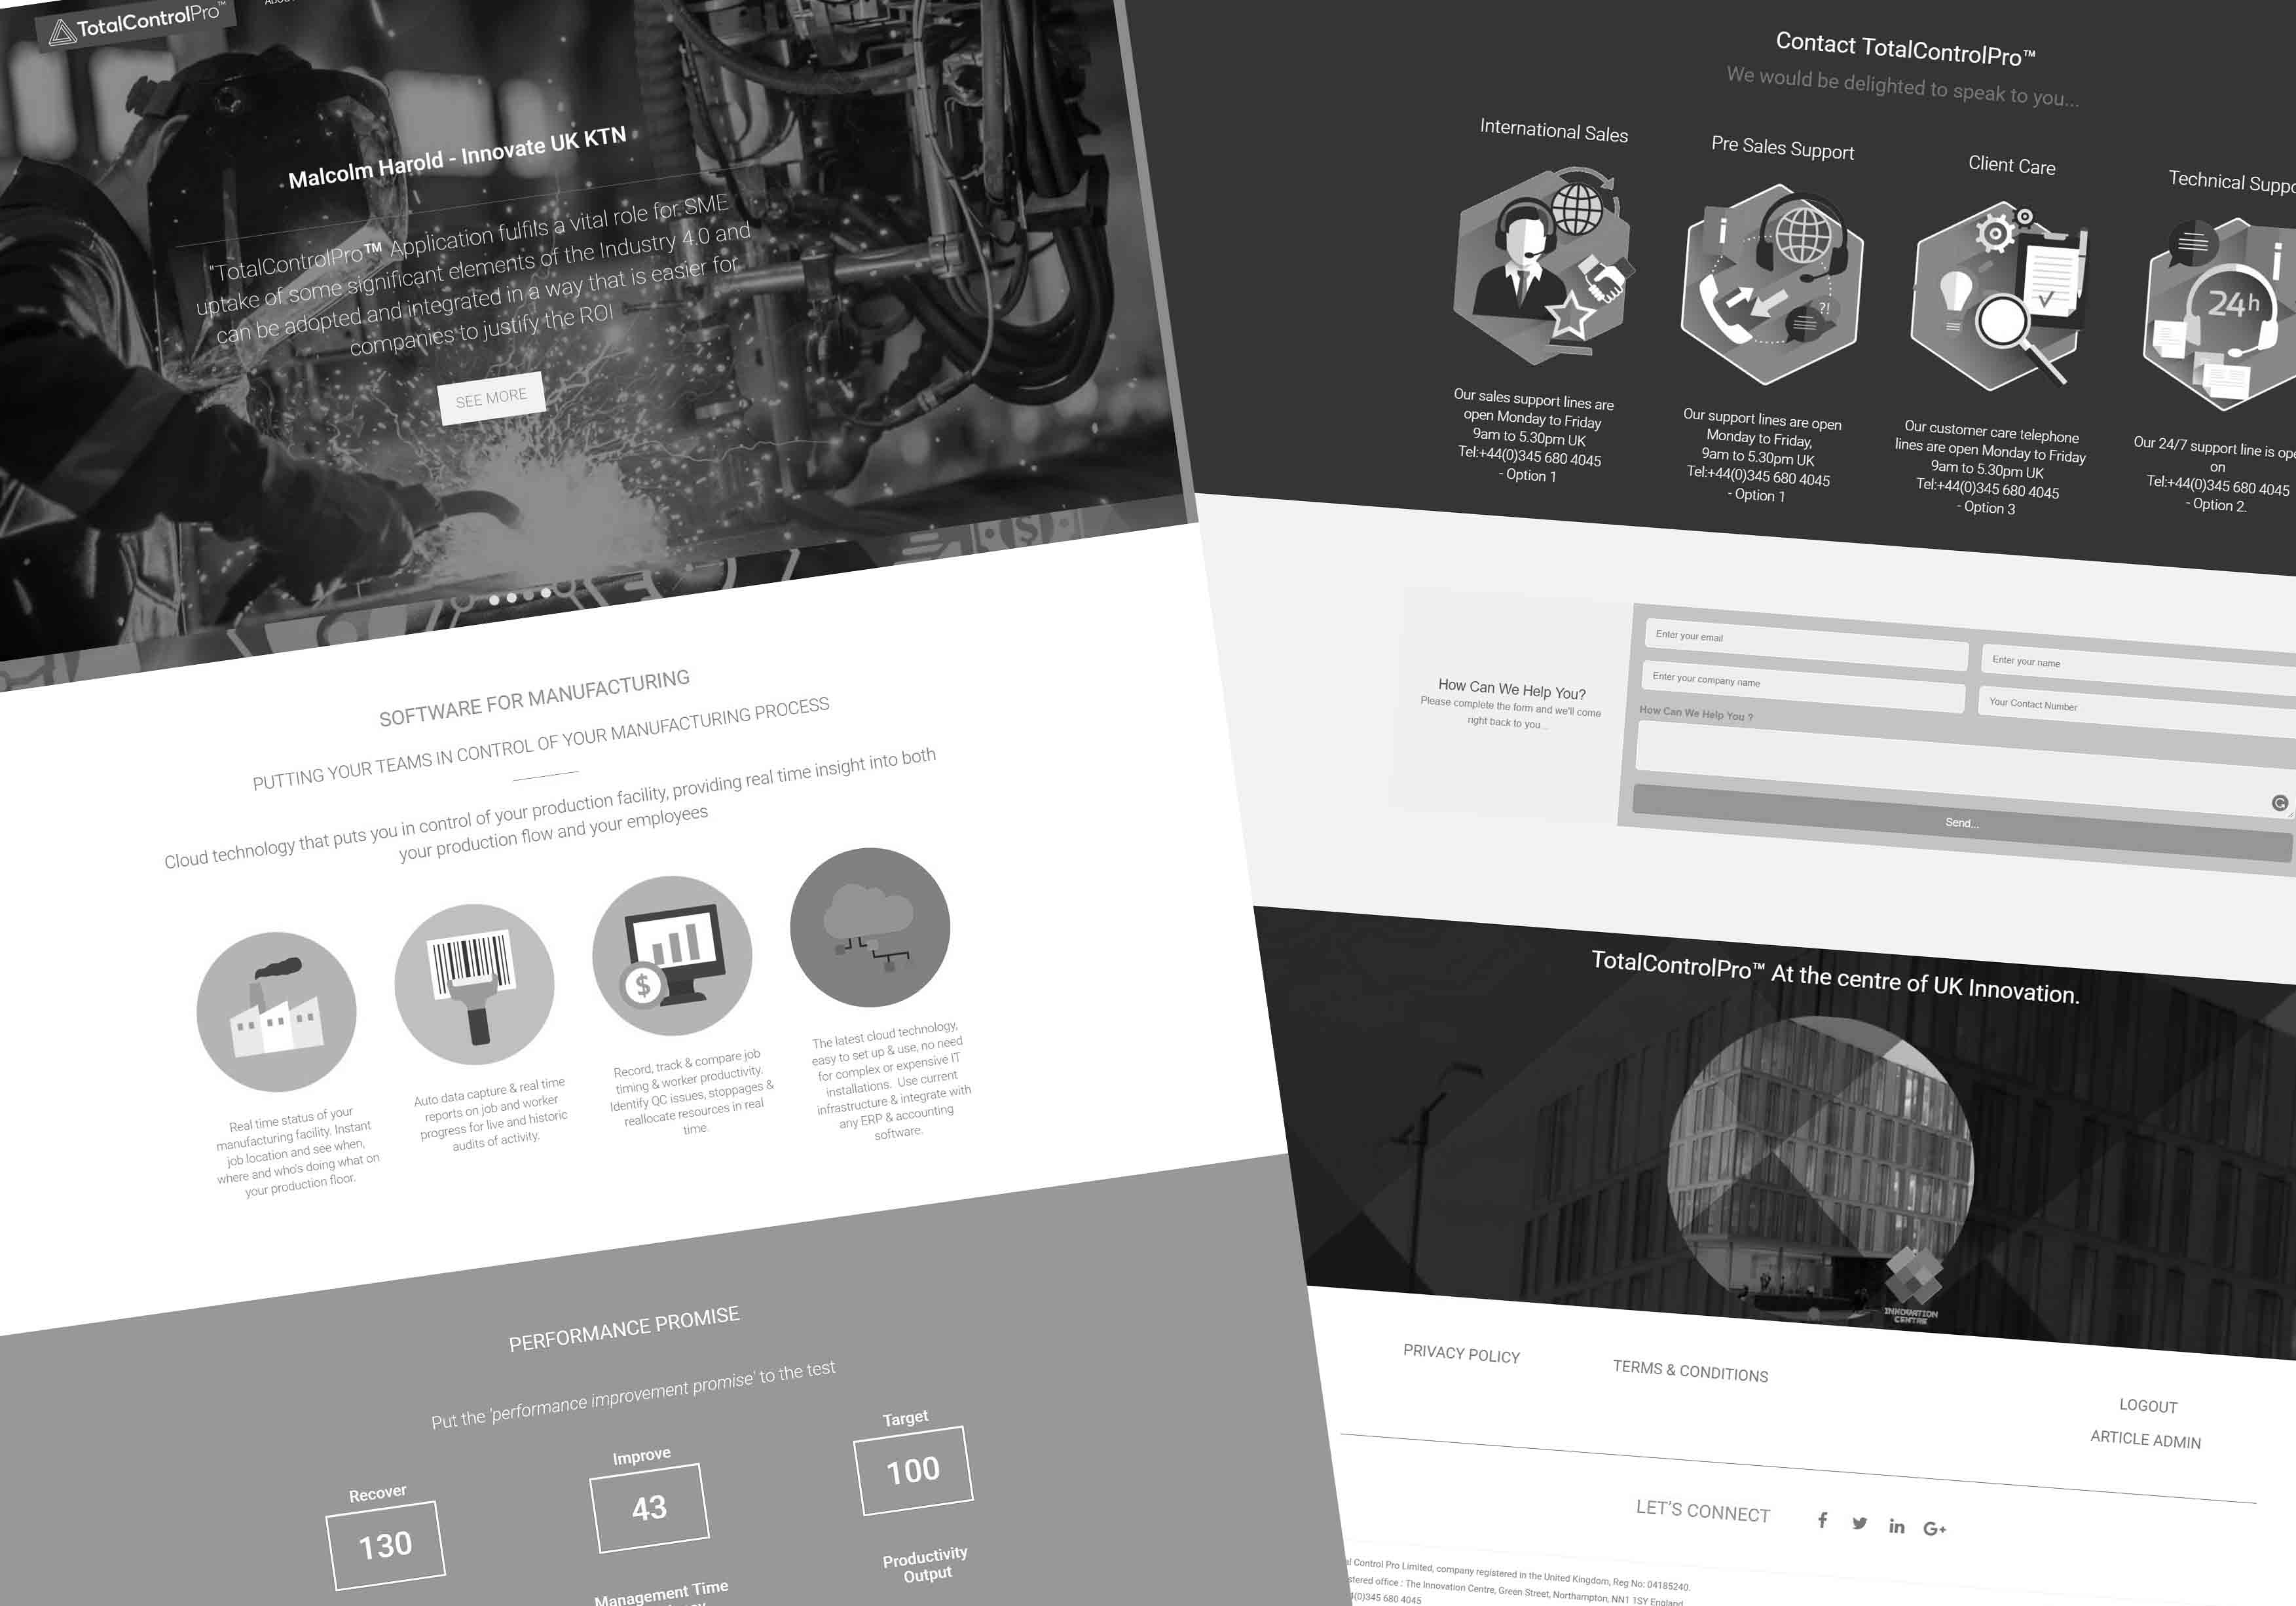 Old TotalControlPro Website Screenshot